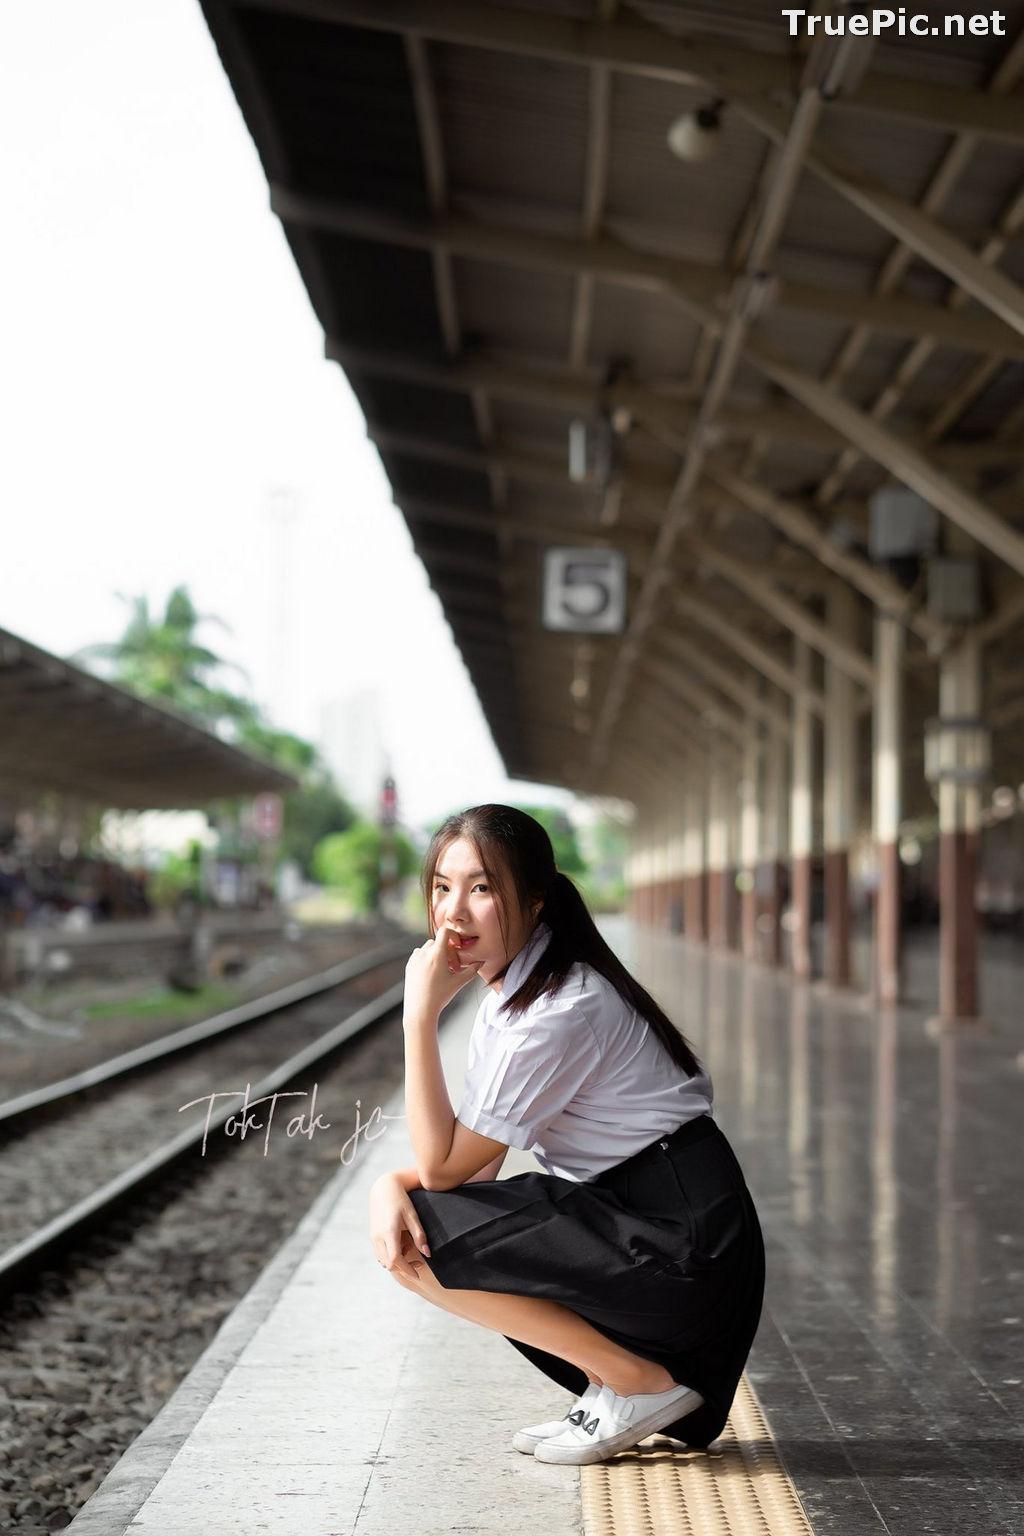 Image Thailand Model - Kornrawee Chokejindachai - Cute Student Girl - TruePic.net - Picture-8